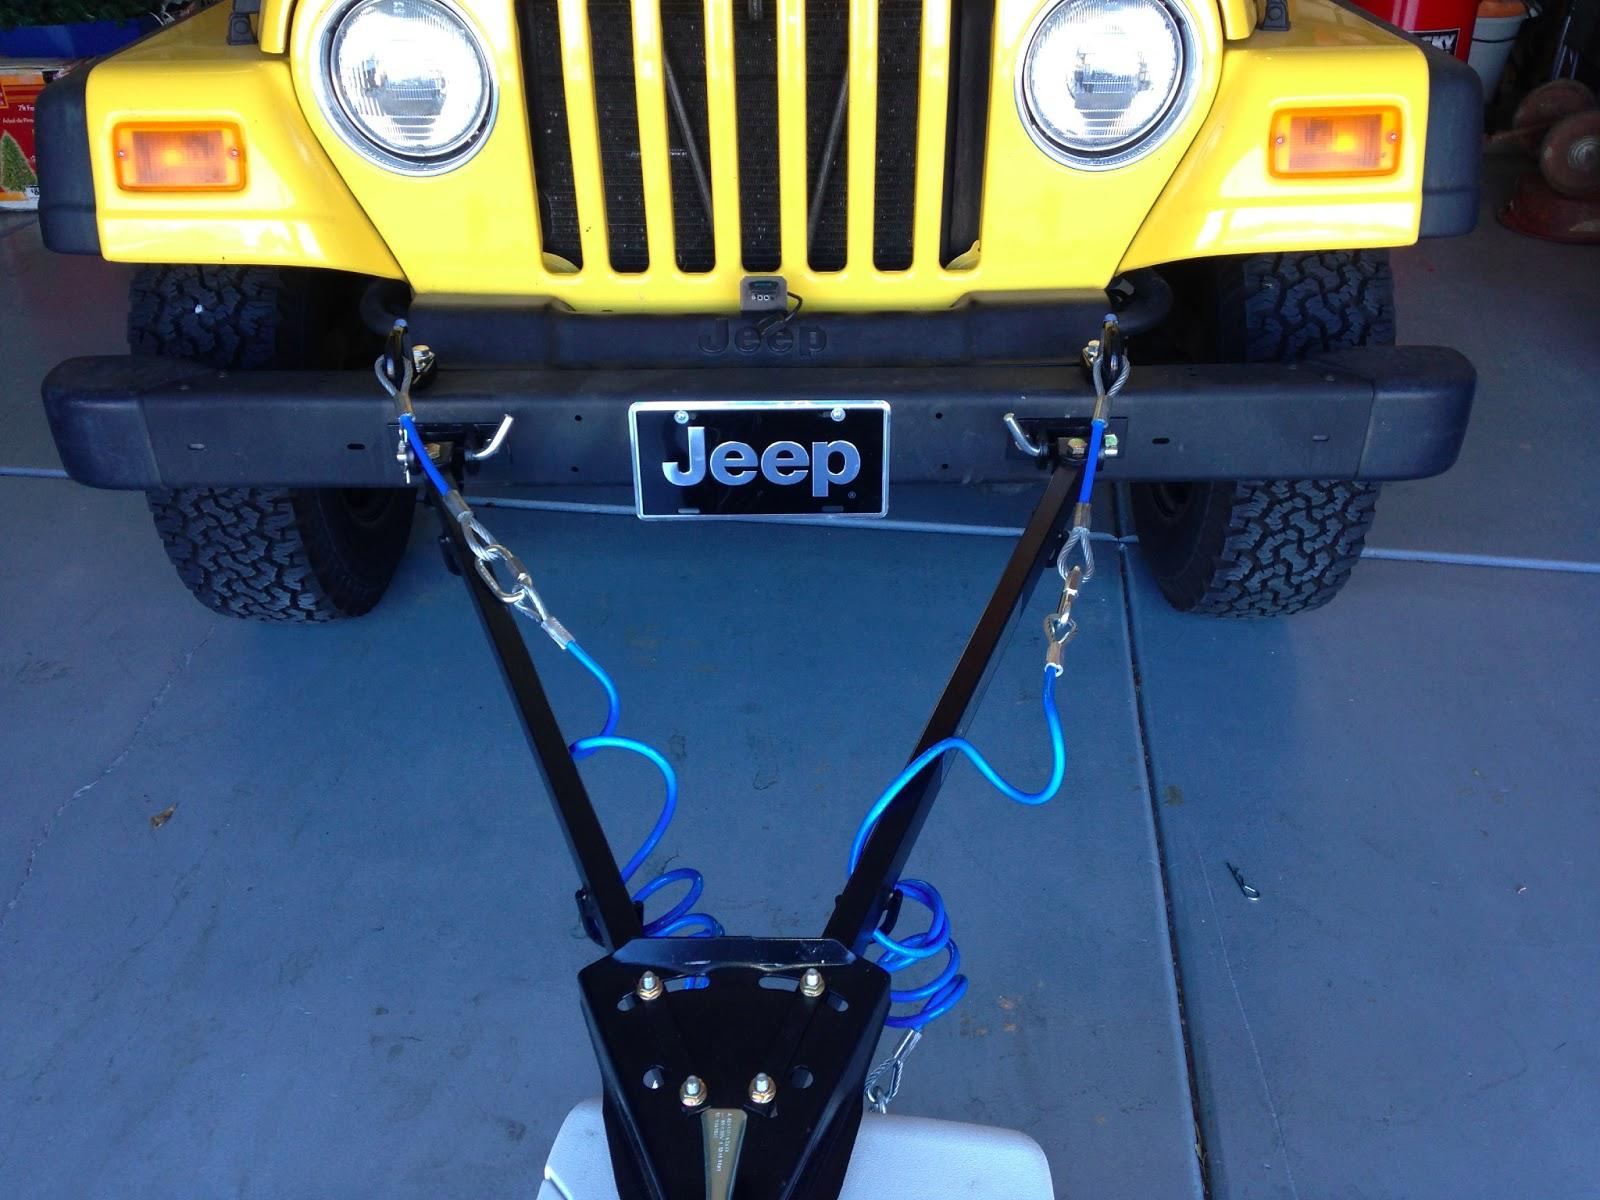 Tj Jeep Wrangler Trailer Wiring - Wiring Diagram All Jeep Wrangler Trailer Wiring Etrailer on jeep commander trailer wiring, jeep wrangler with trailer, jeep xj trailer wiring, jeep jk wiring harness, jeep wrangler trailer controller, jeep jk trailer, hyundai santa fe trailer wiring, jeep cherokee trailer wiring, jeep wrangler trailer fuses, jeep liberty tail light wiring diagram, jeep liberty trailer wiring, jeep trailer wiring diagram, jeep wrangler radio wiring, jeep wrangler trailer hitches, toyota 4runner trailer wiring, jeep wrangler wiring schematic, toyota truck trailer wiring, jeep wrangler camping trailer, jeep patriot trailer wiring, 2013 jeep wrangler hitch wiring,